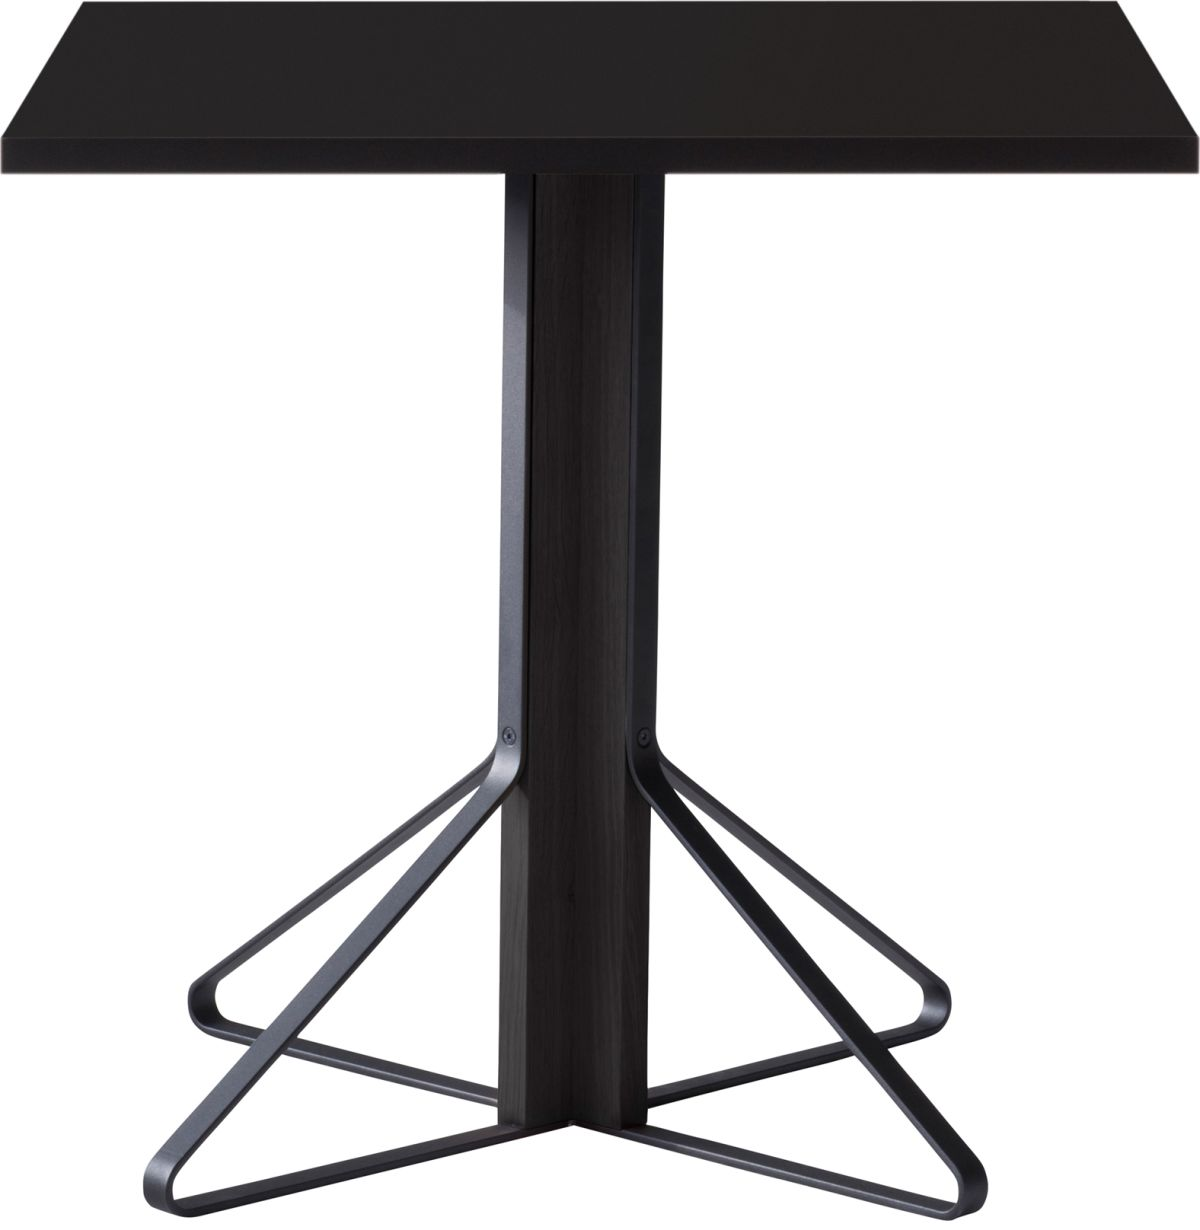 Kaari_Table_Square_Legs-Black-Laquered-Oak_Top-Black-Hpl_Cut_Out_Srgb-2430508